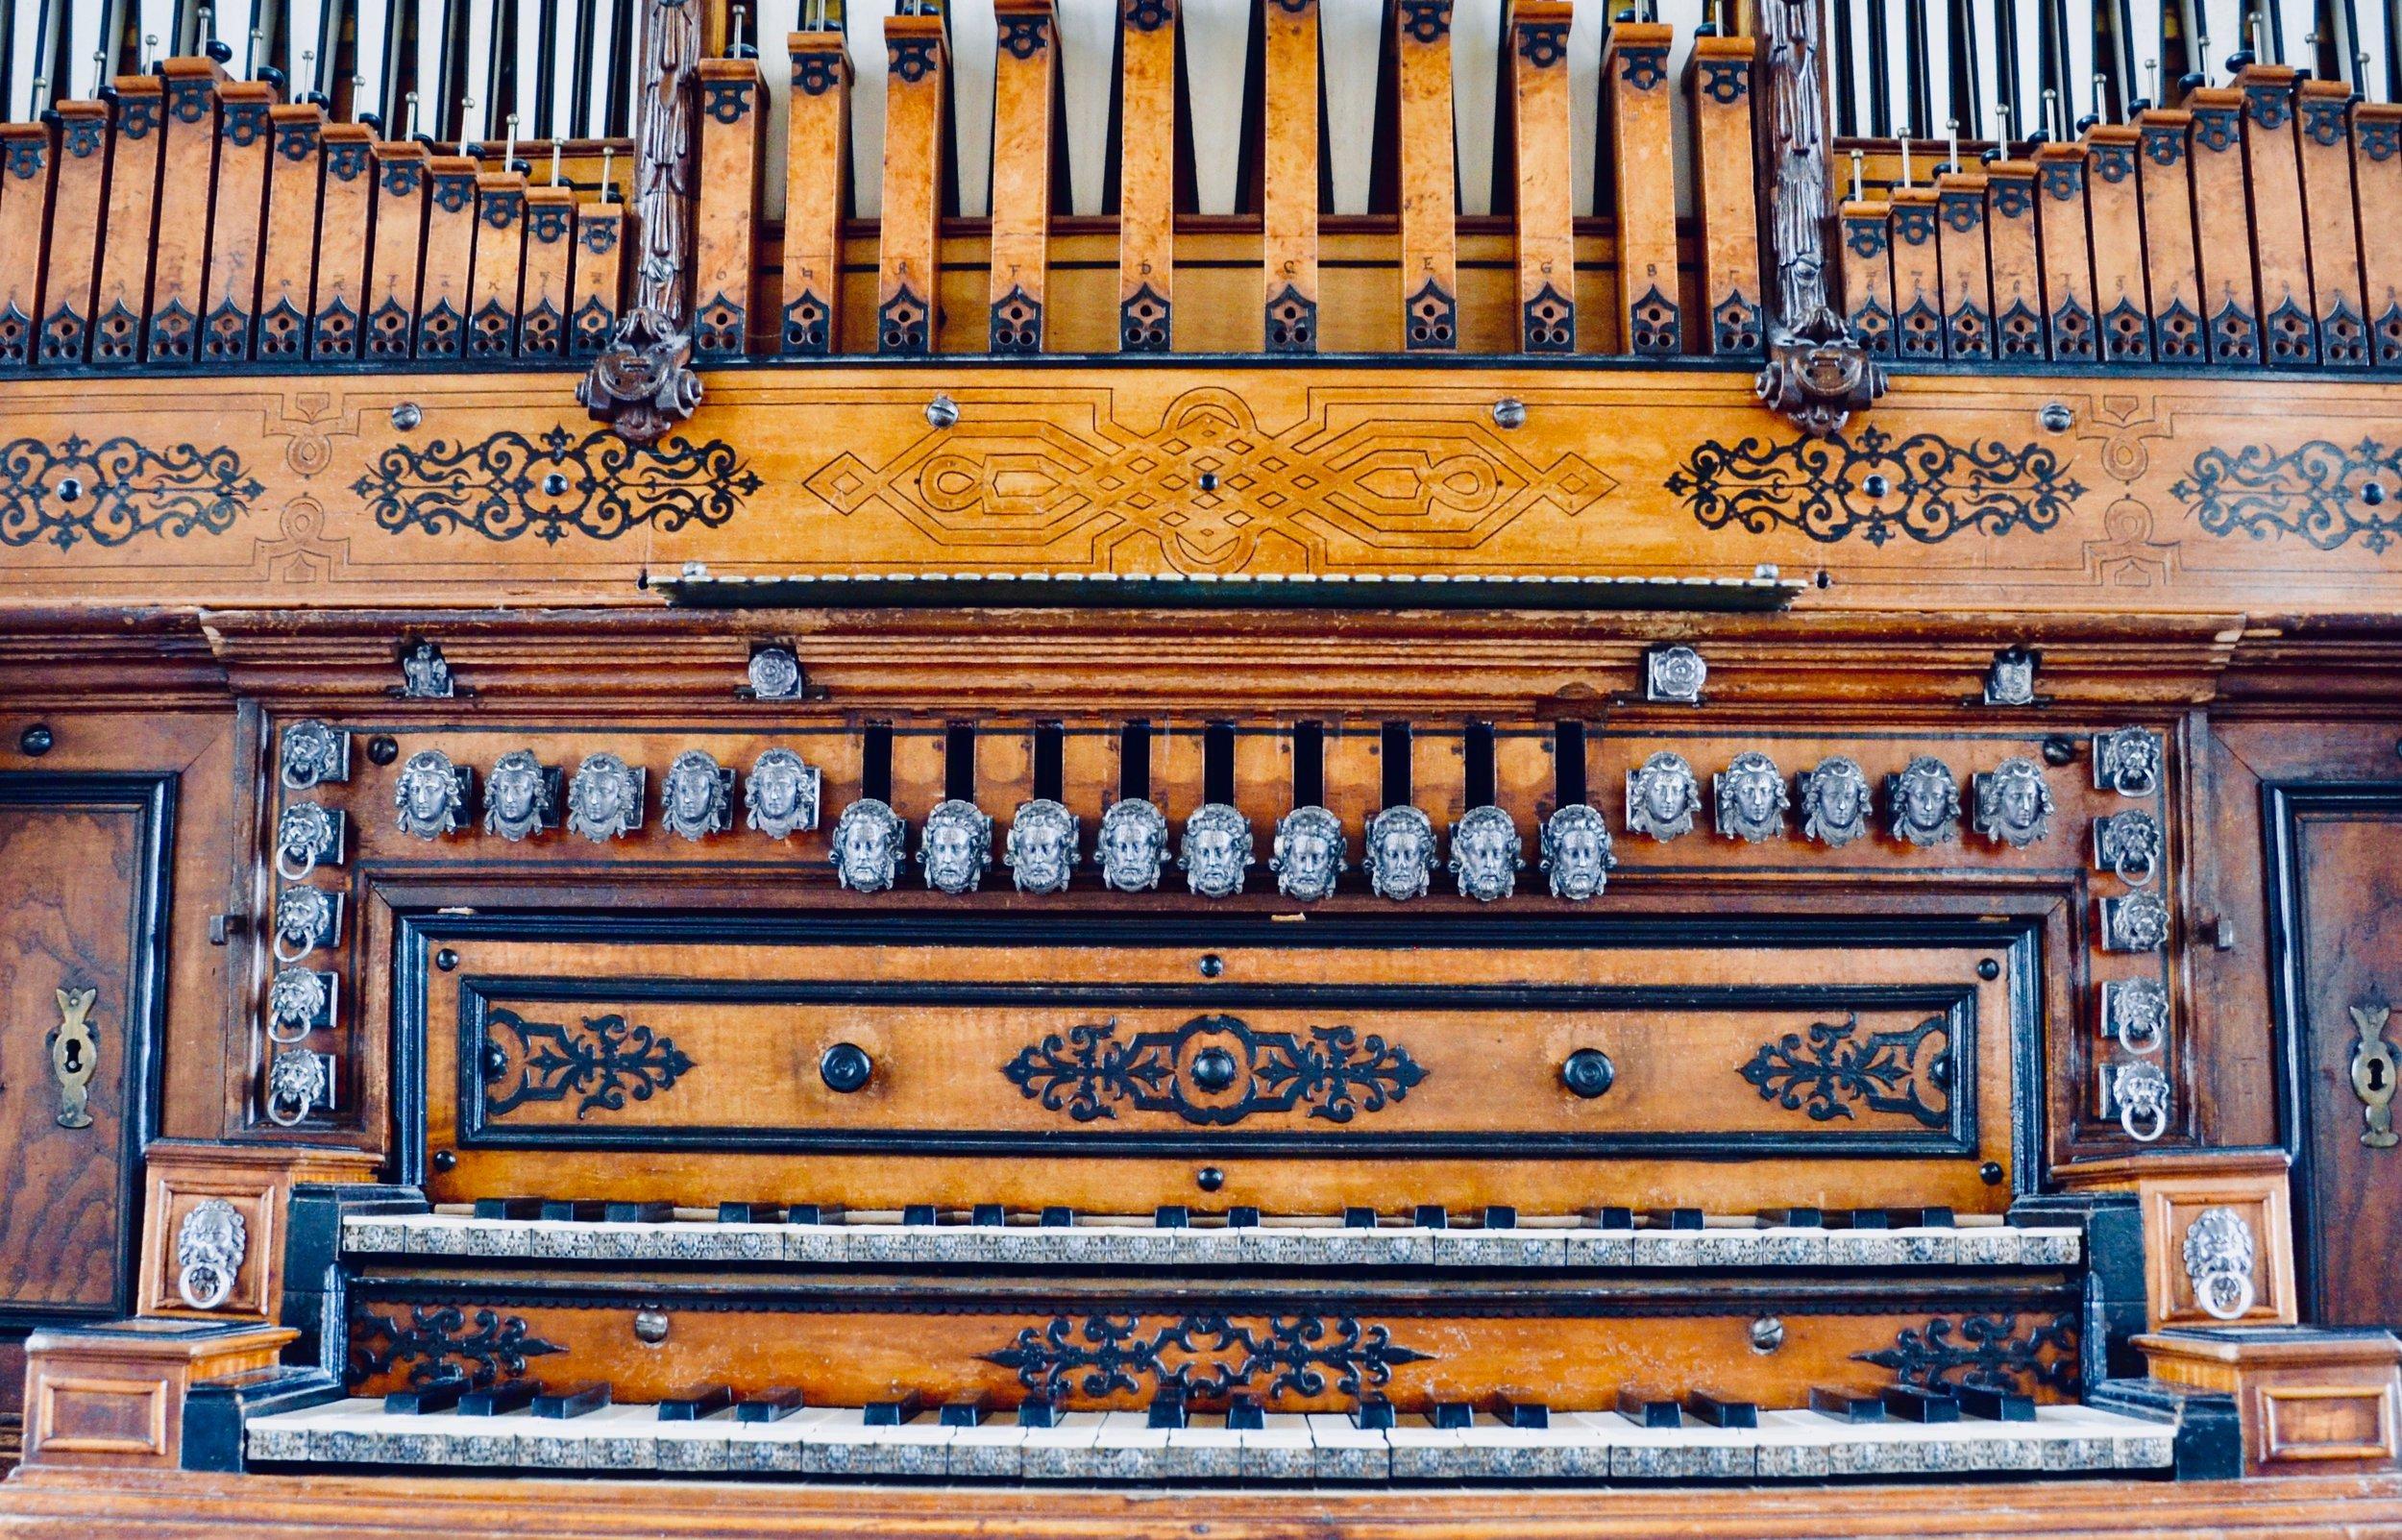 Keydesk detail, 1610 Compenius organ, Frederiksborg Castle, Hillerød, Denmark.